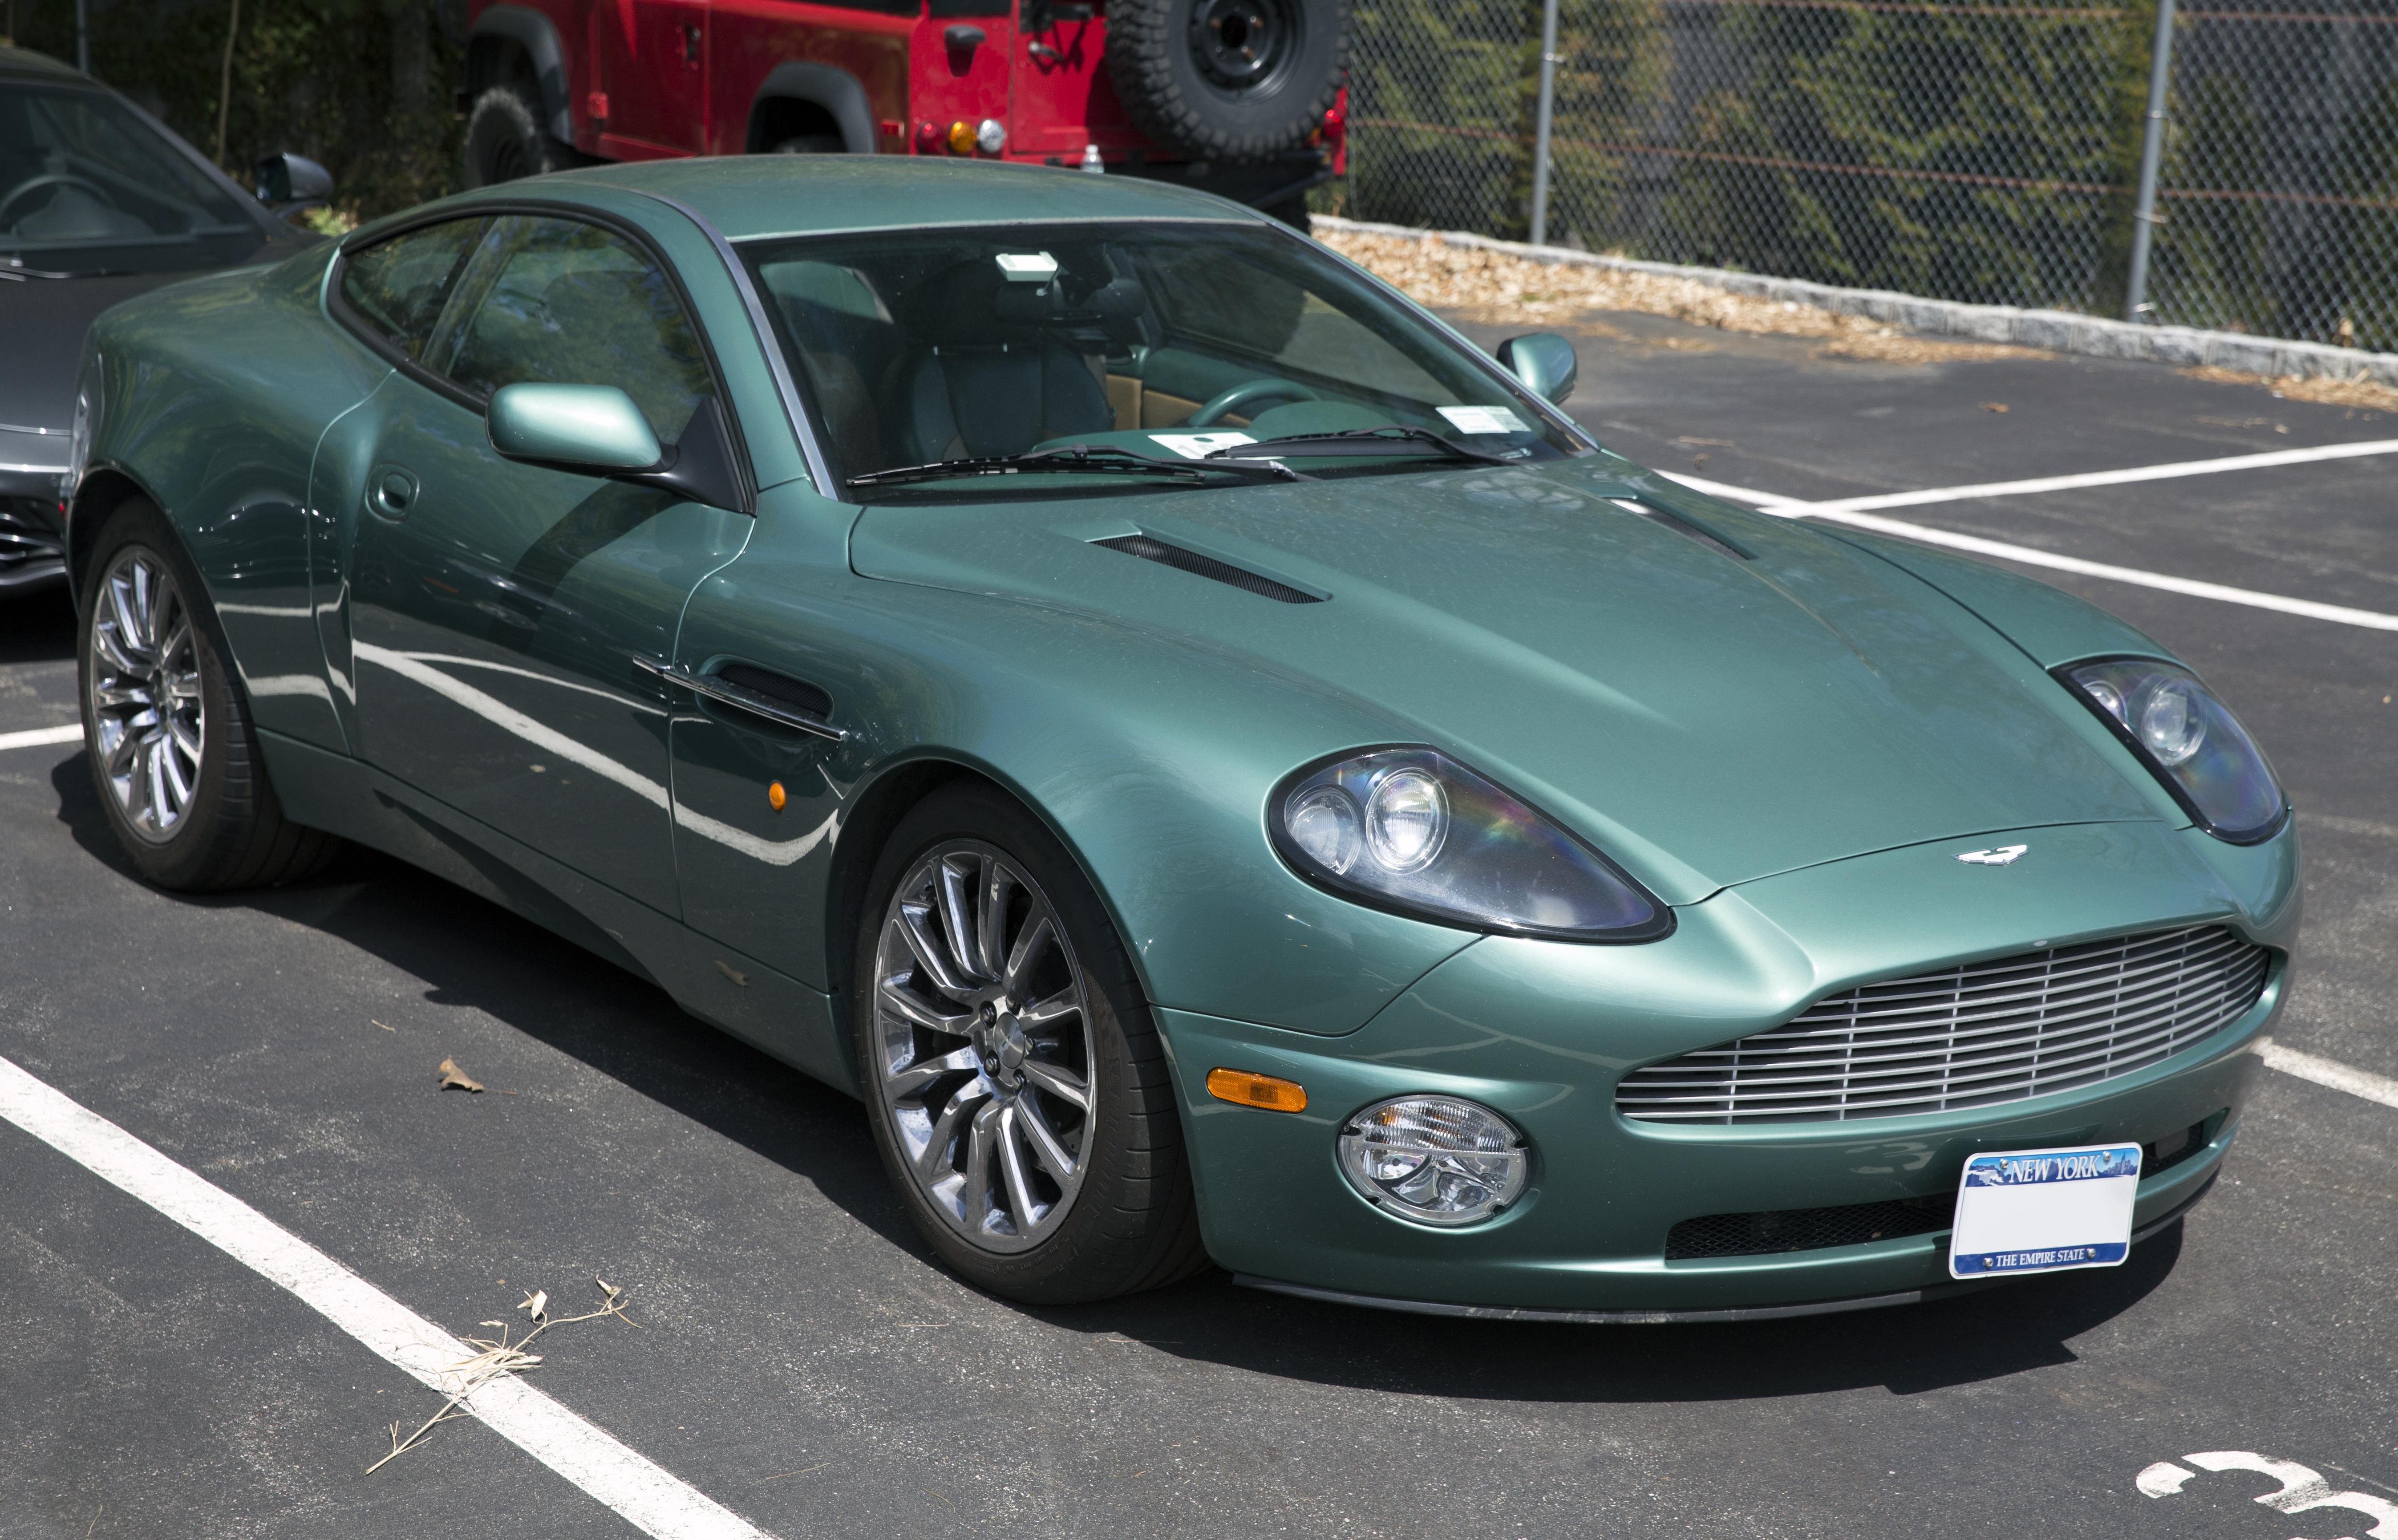 File 2002 Aston Martin V12 Vanquish Am Racing Green Front Right Jpg Wikimedia Commons